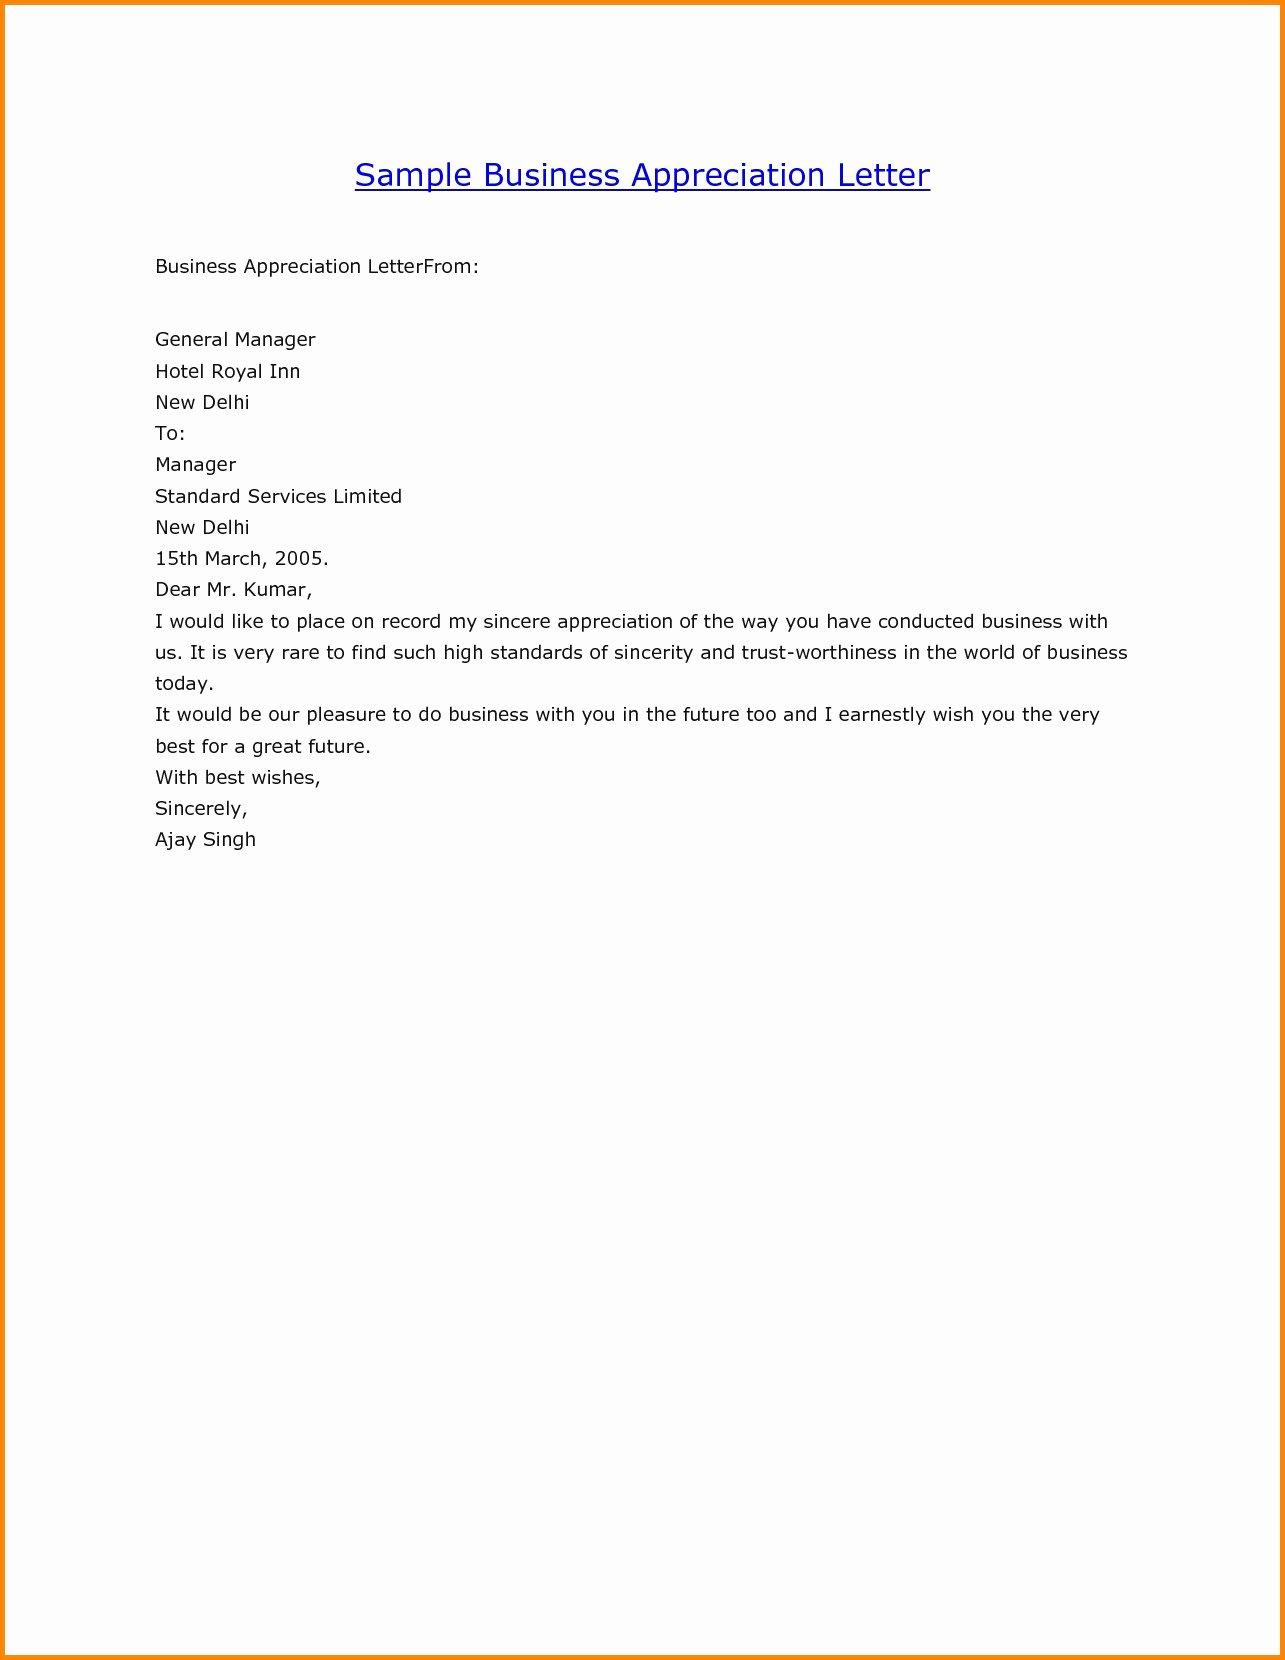 Business Appreciation Letter